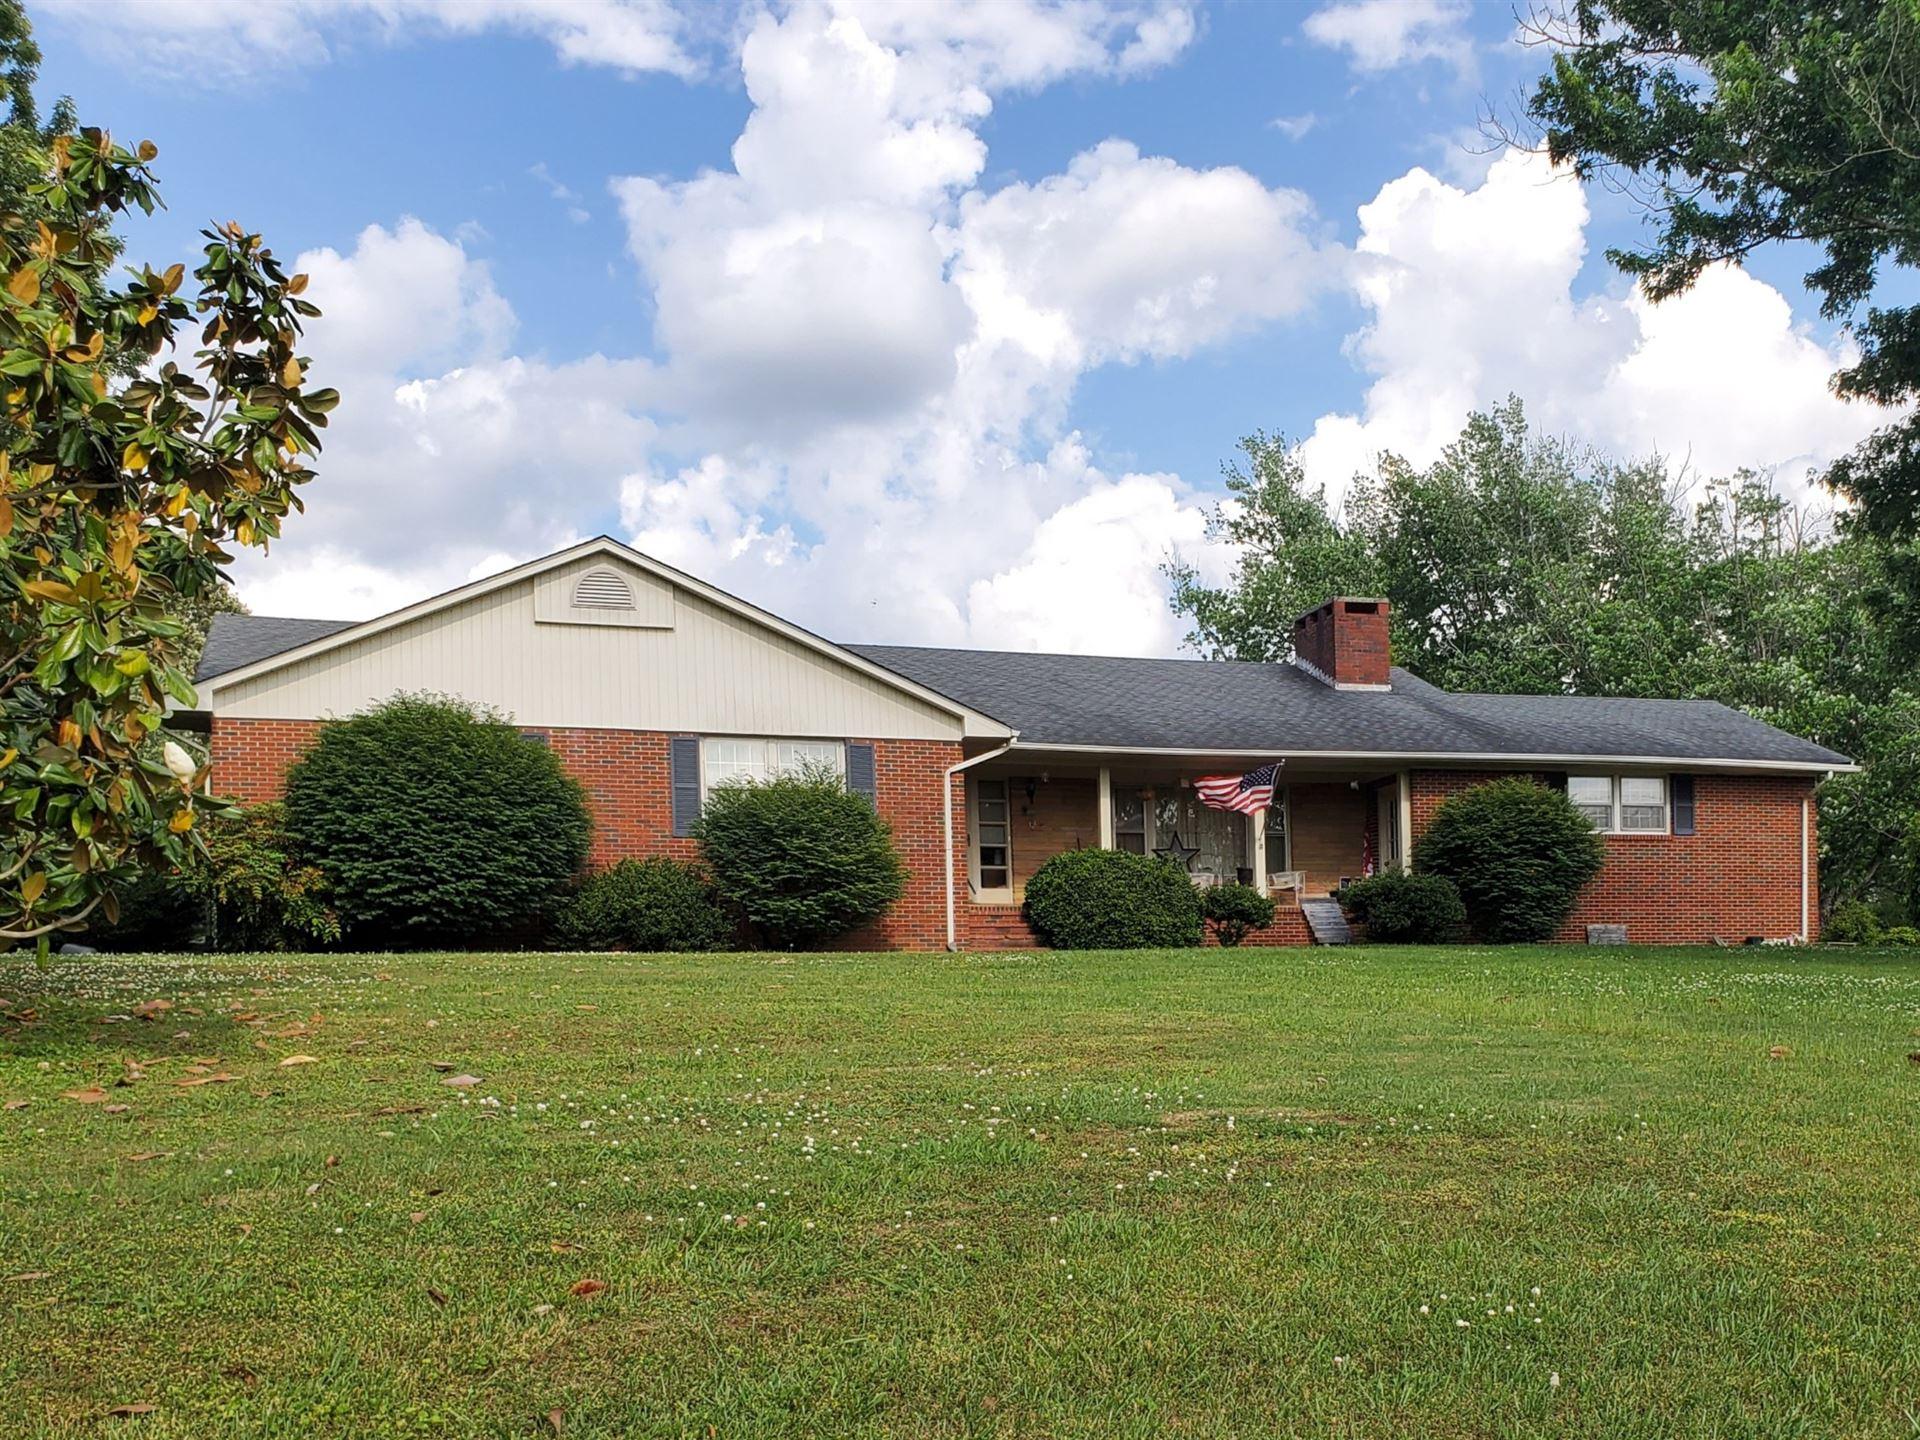 3656 Smithville Hwy, McMinnville, TN 37110 - MLS#: 2257630